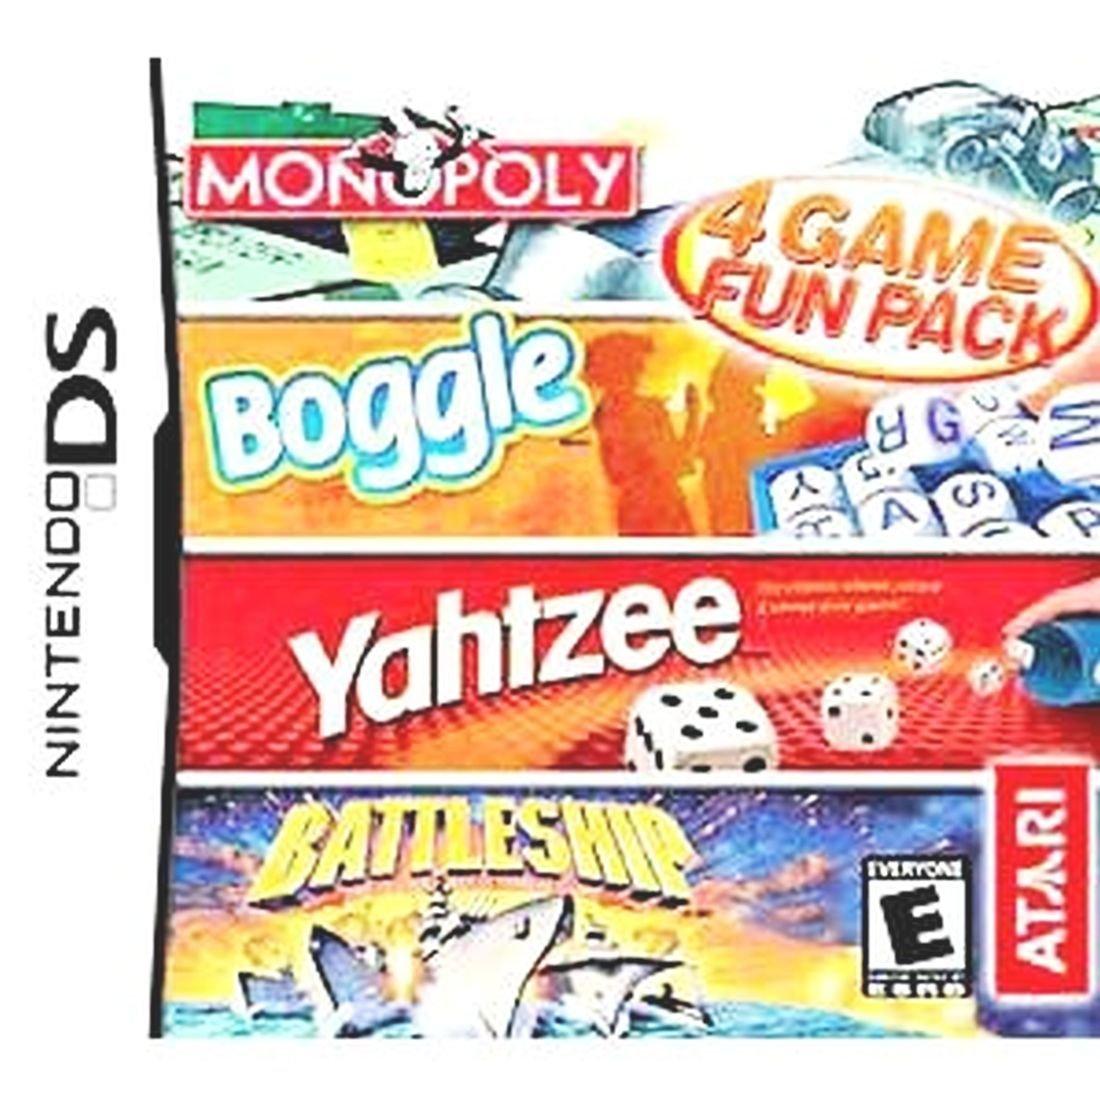 Monopoly/Boggle/Yahtzee/Battleship / Game [Importación Inglesa]: Amazon.es: Videojuegos